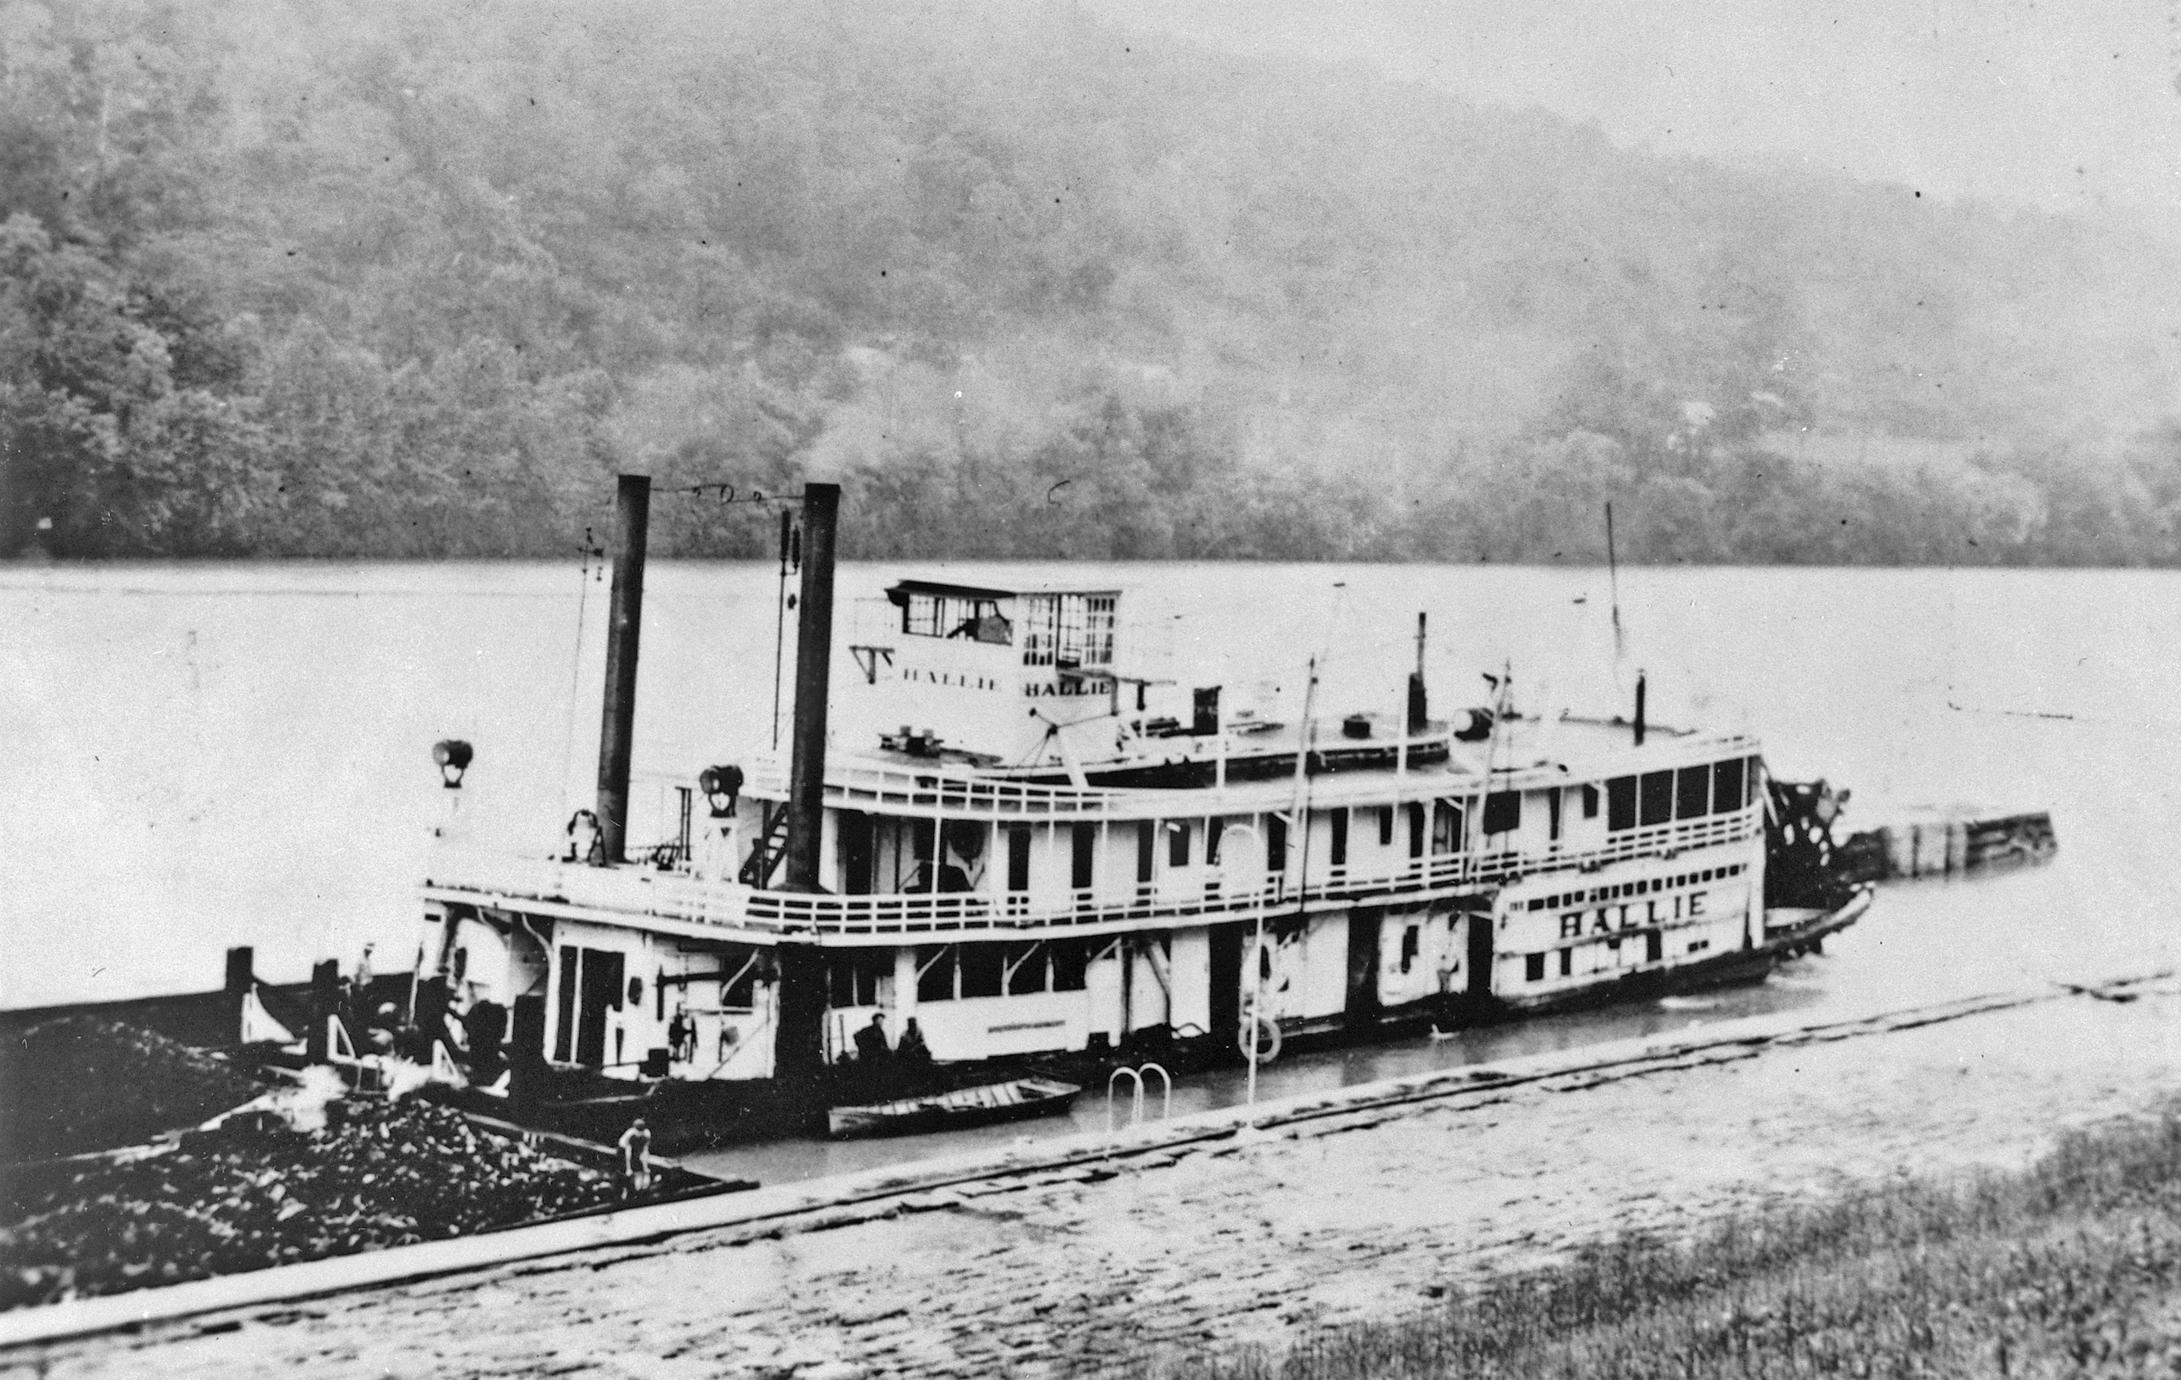 Hallie (Towboat, 1933-1938)